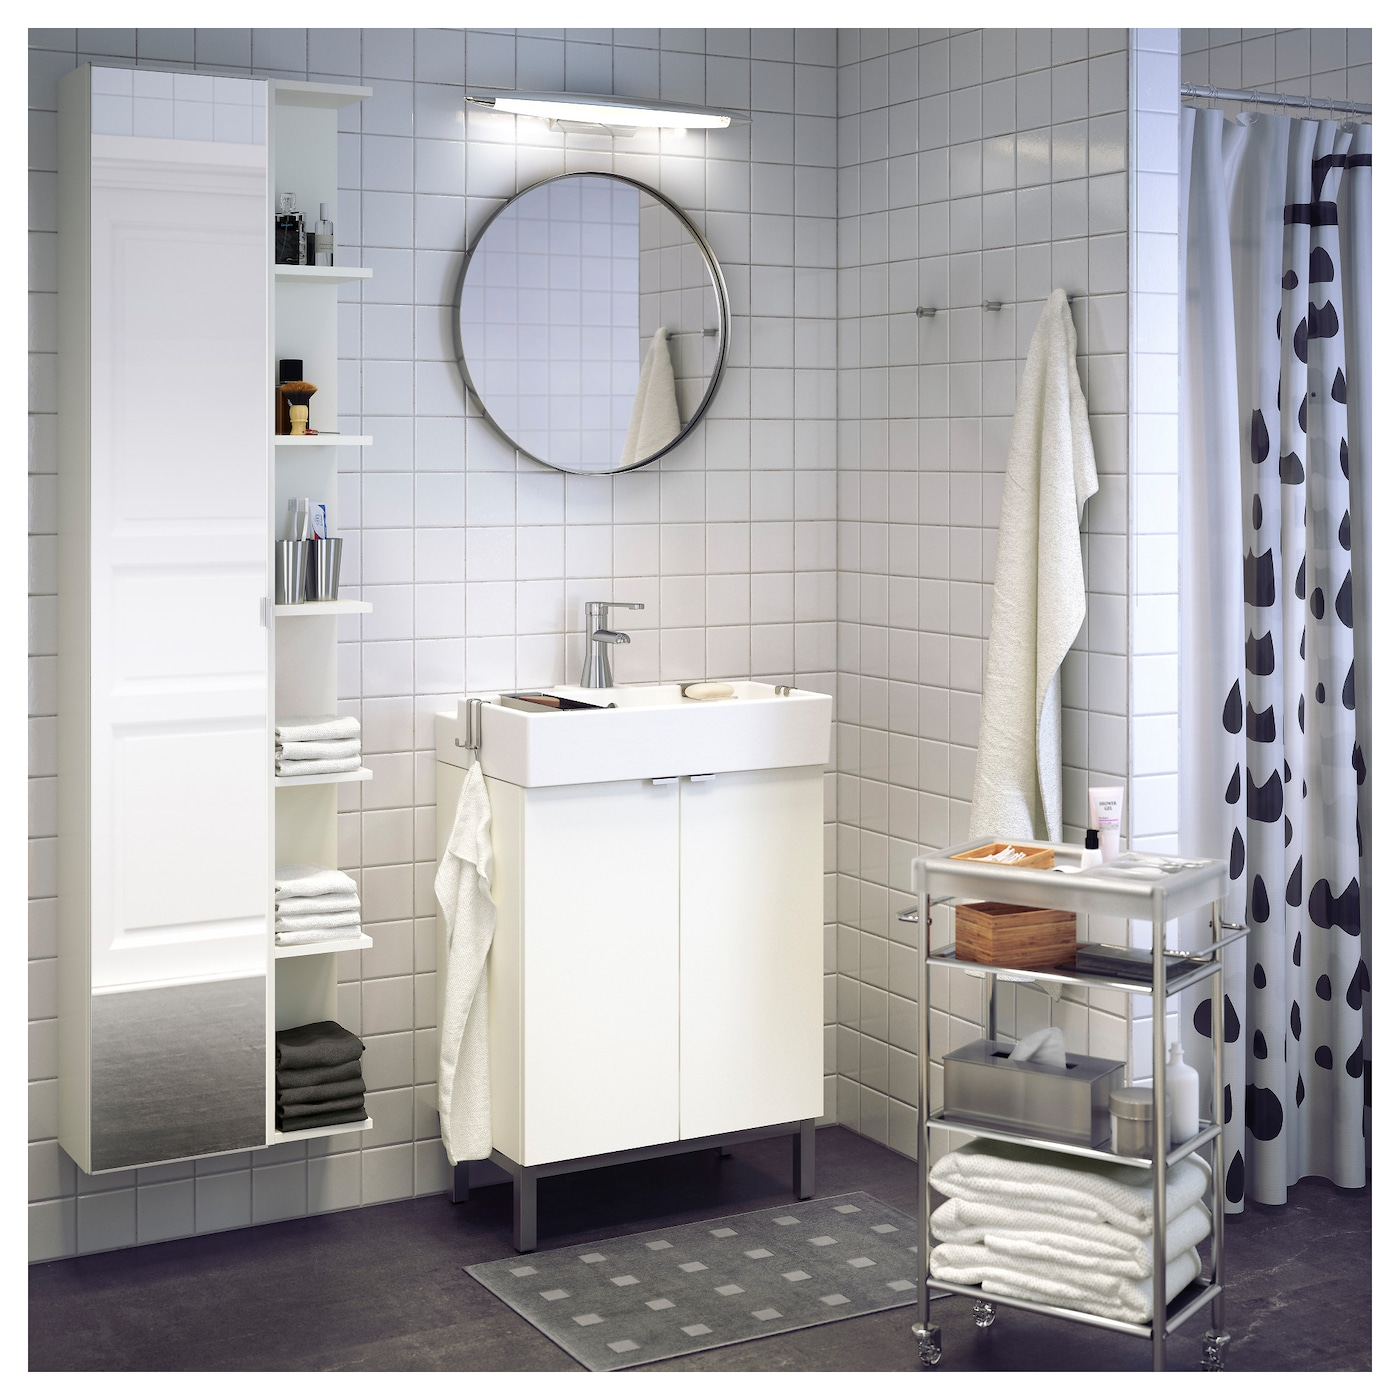 Lillangen High Cabinet With Mirror Door White 11 3 4x8 1 4x70 2 Ikea